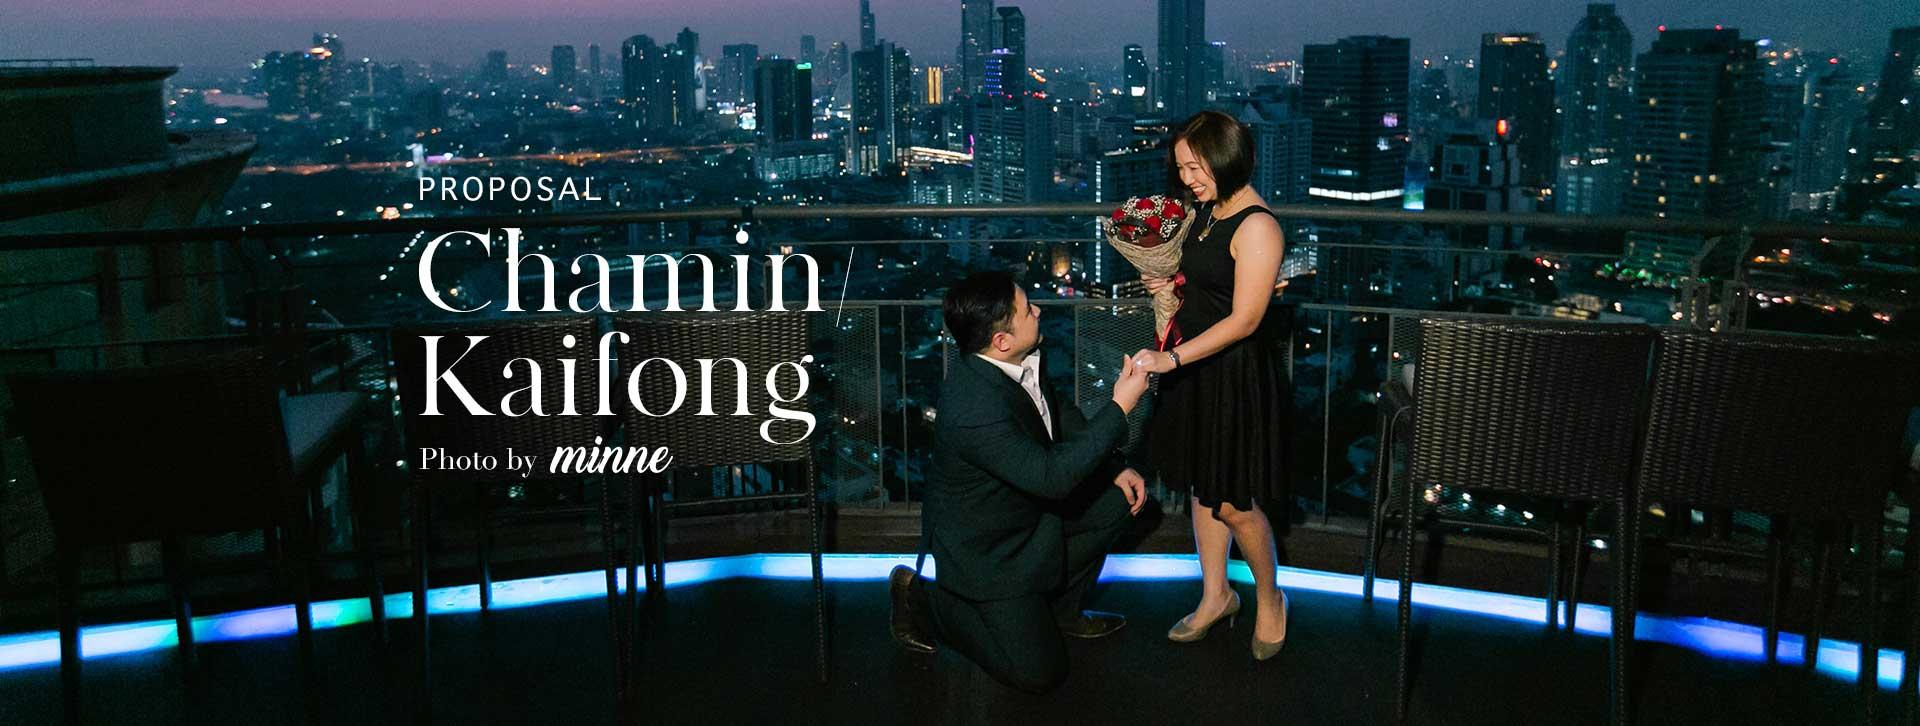 proposal photoshoot bangkok thailand zoom sky bar long cover